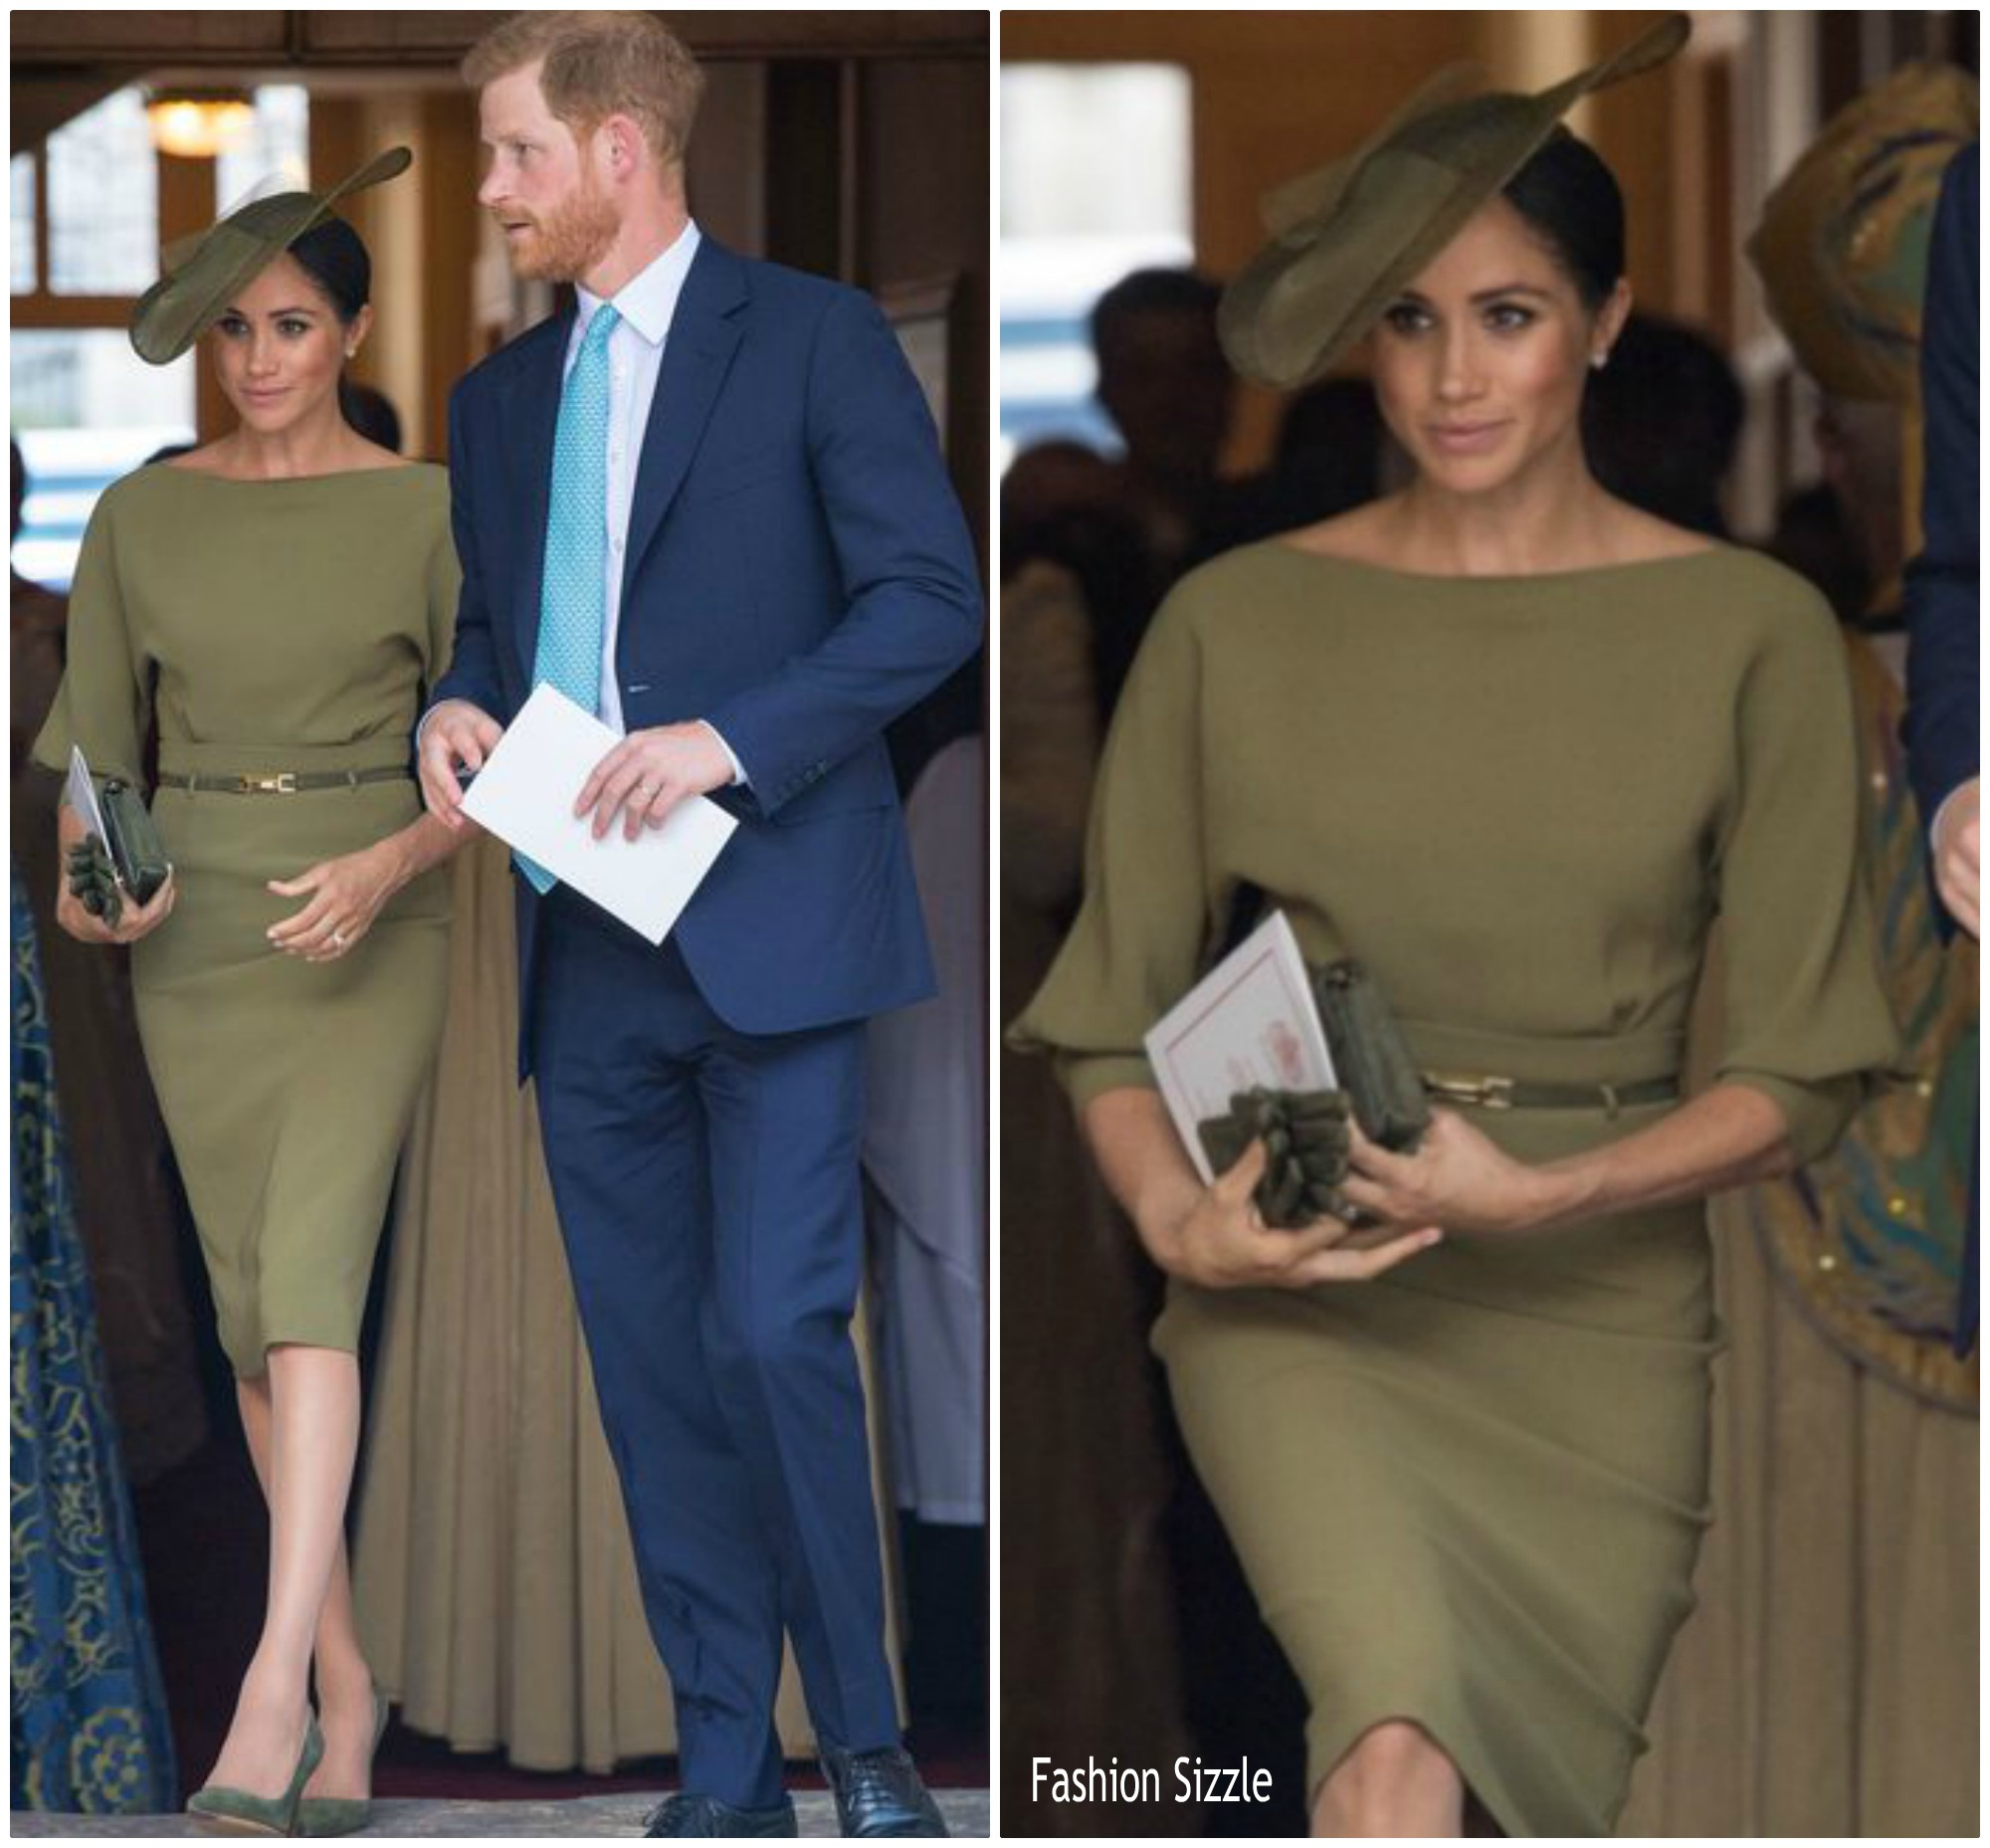 meghan-duchess-of-sussez-in-ralph-lauren-hrh-prince-louis-of-cambridge-christening